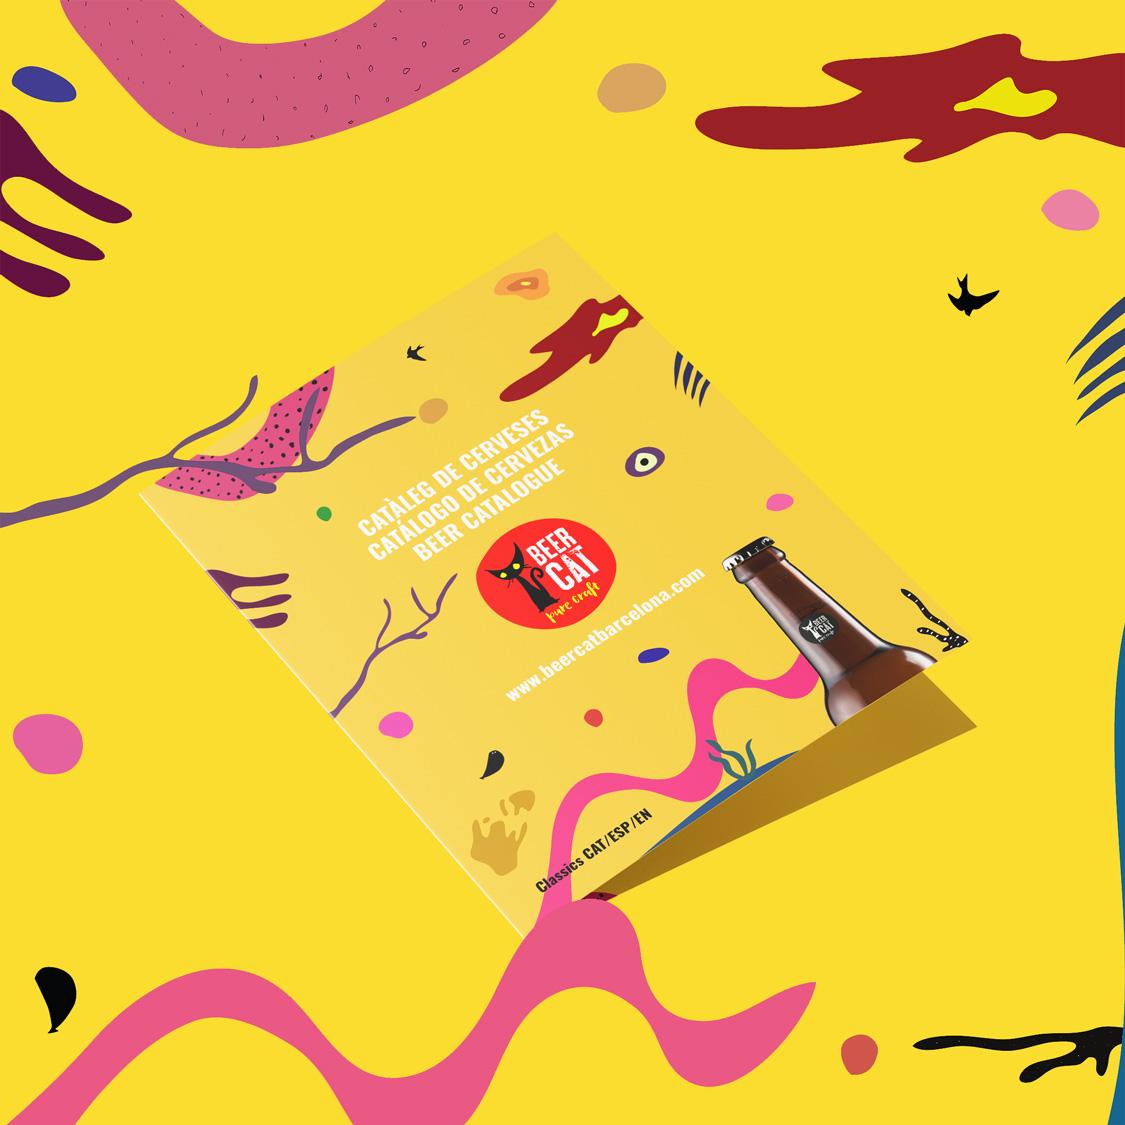 catalougue angelspinyol disseny grafic penedes - BEERCAT - Il·lustracions i disseny per etiquetes cerveses artesanes